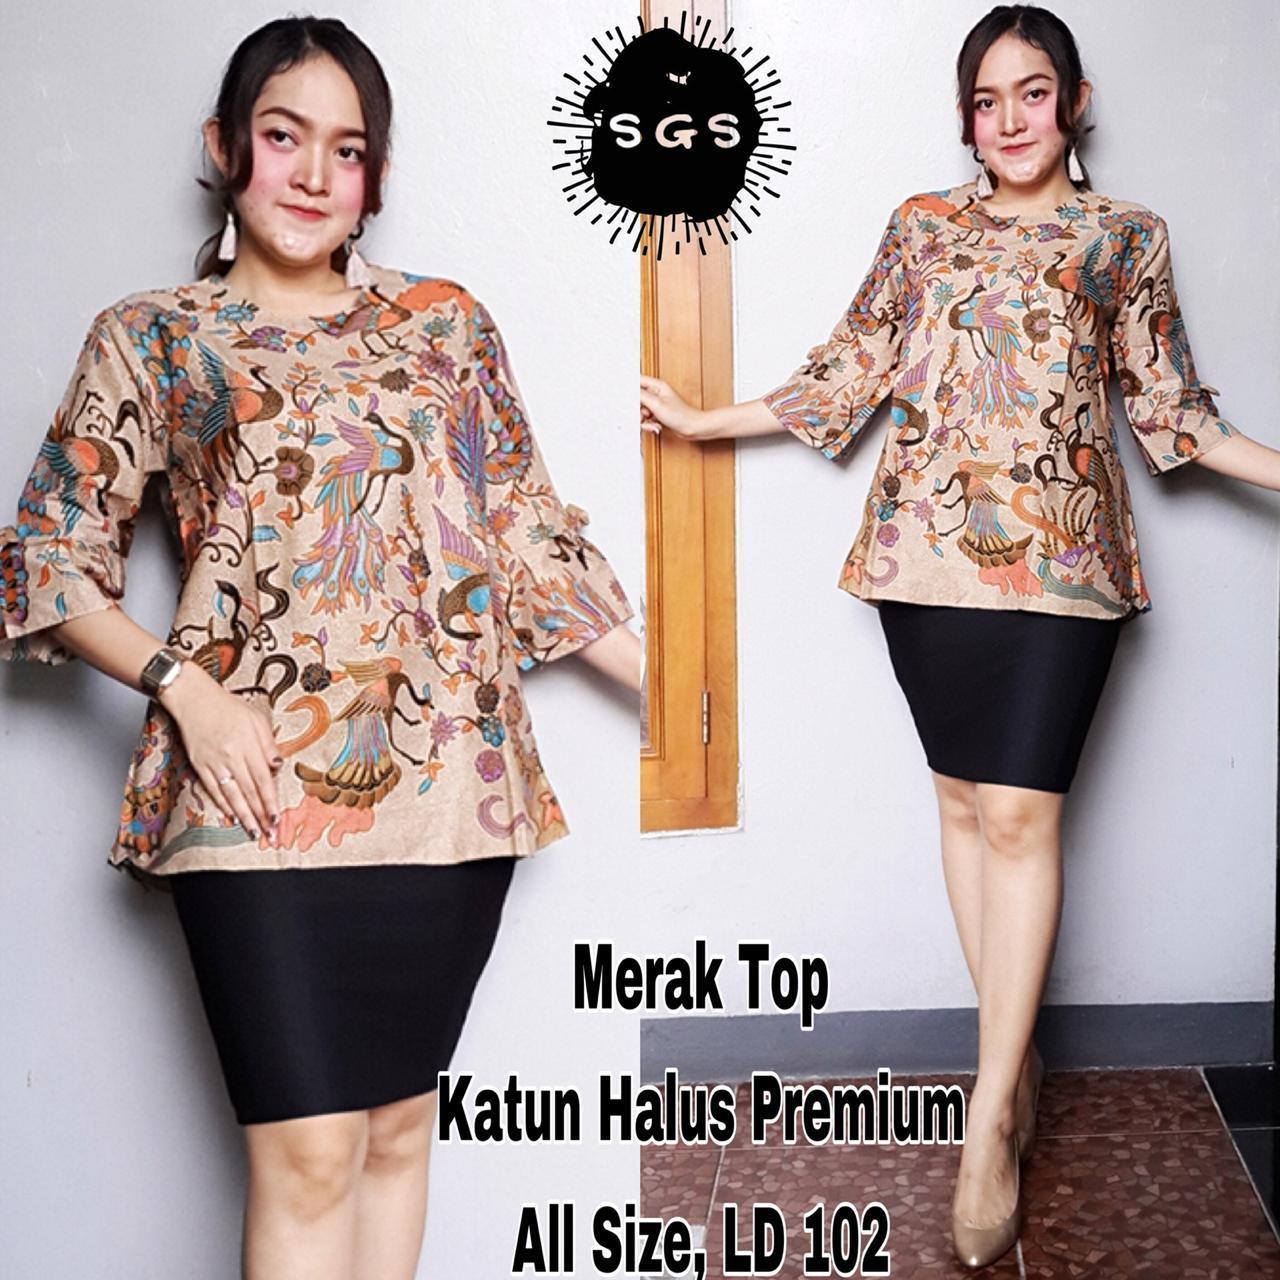 Blouse Tunik Wanita Samantha Atasan Fashion Muslim Dress  Baju Batik Blus Kerja Lengan Panjang Premium Motif Merak